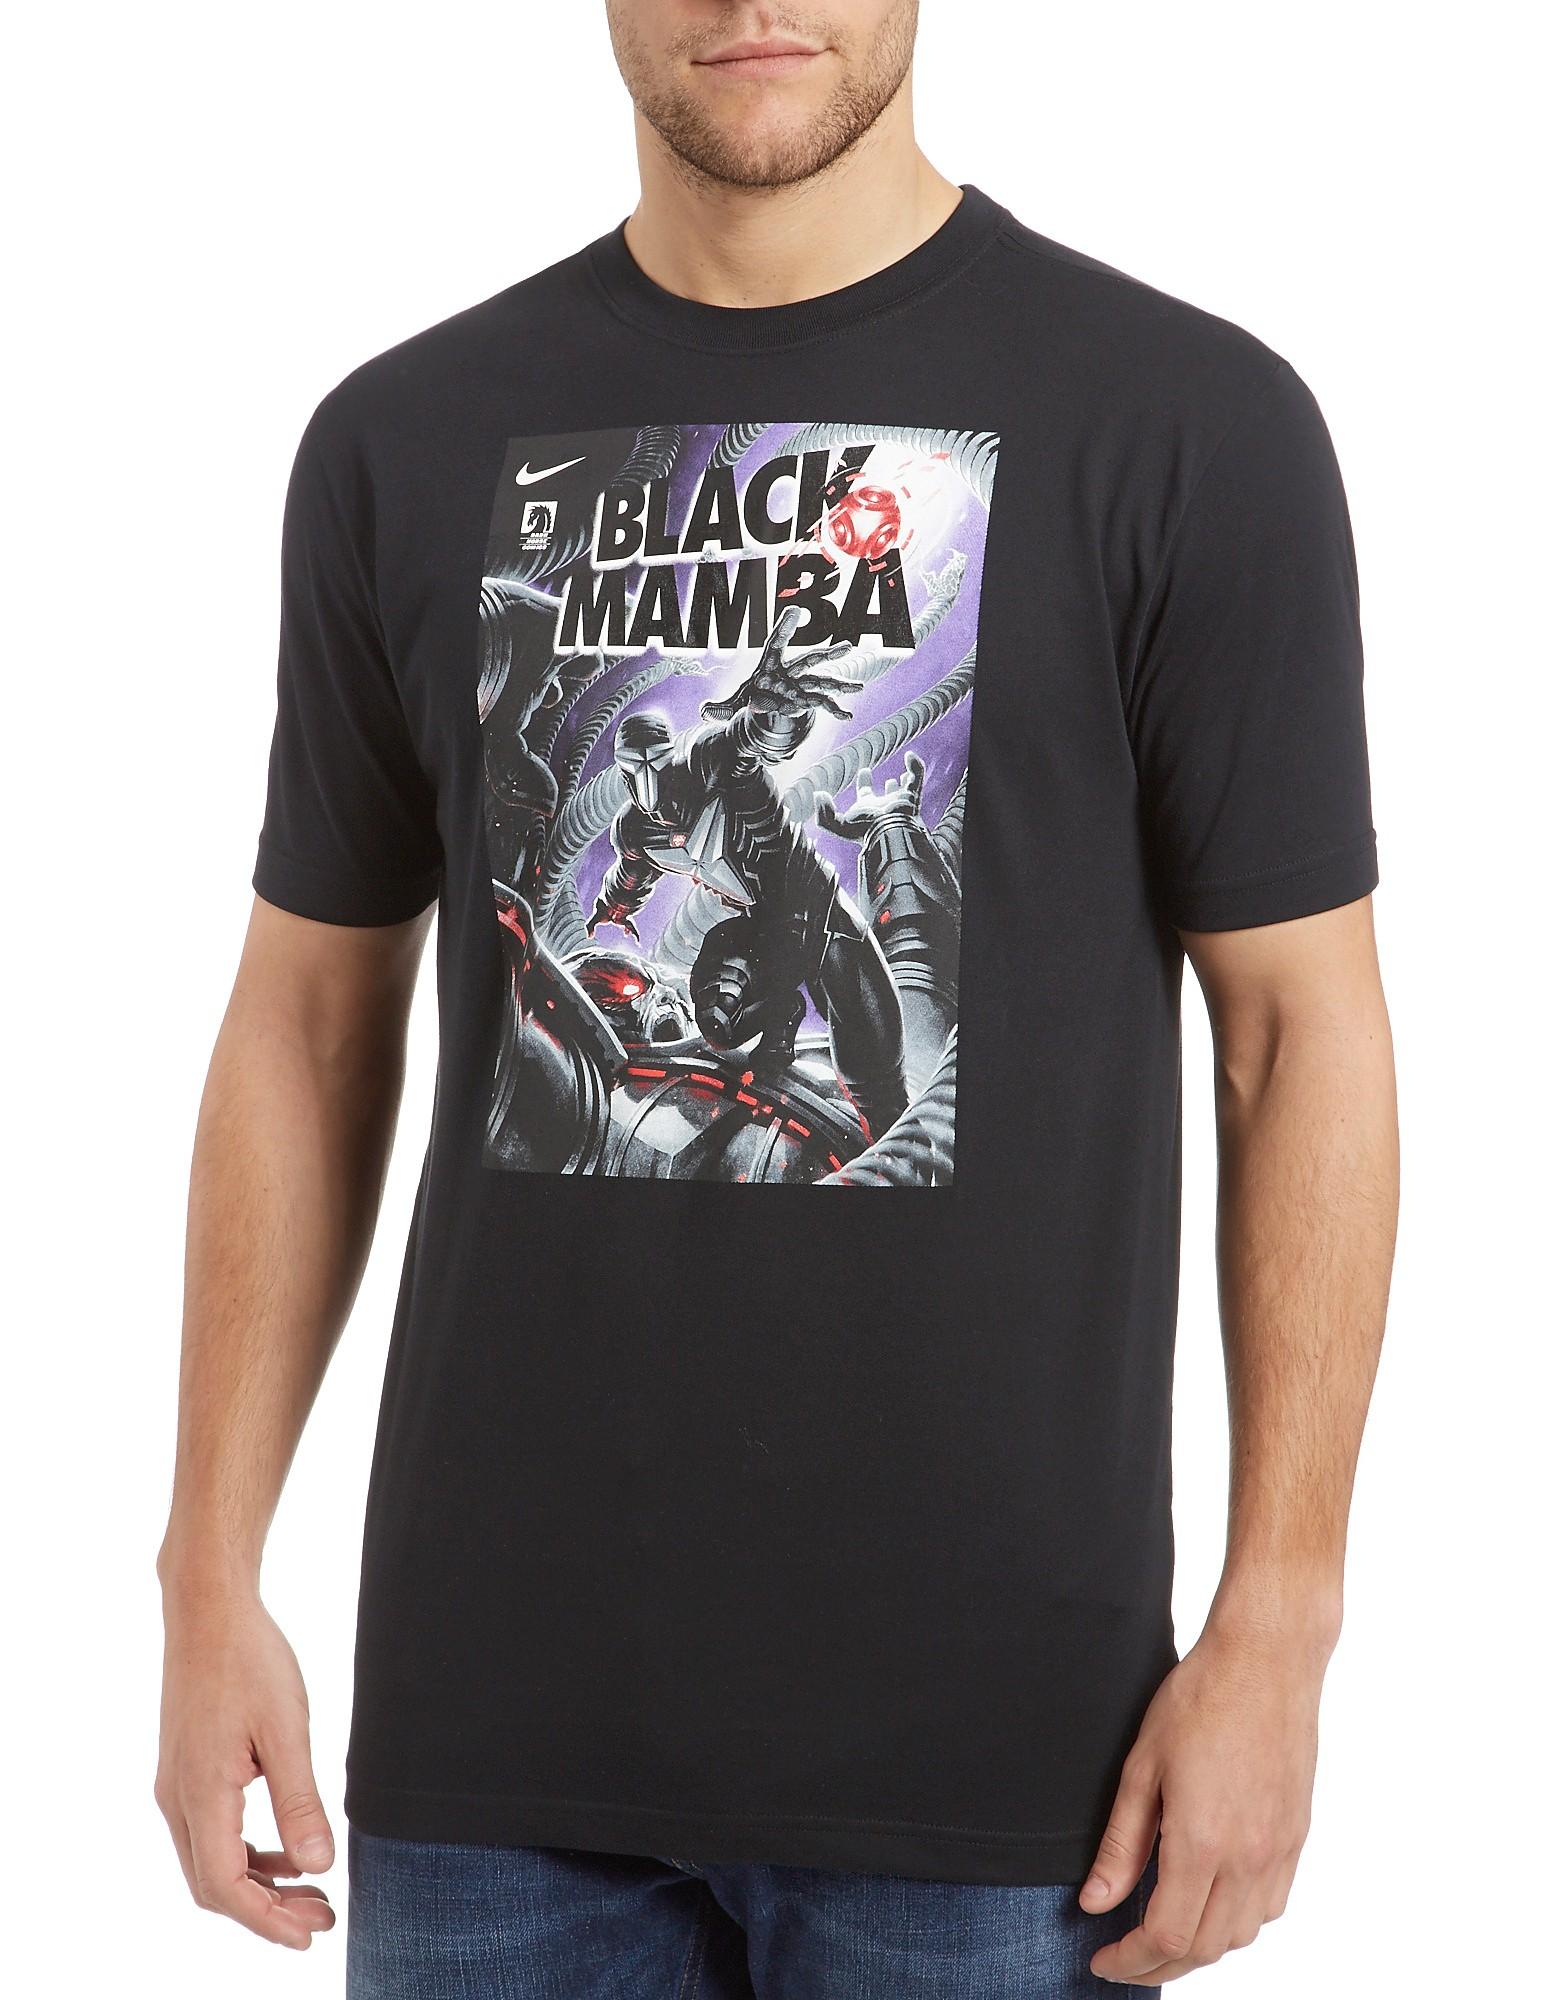 Nike Kobe Bryant Hero T-Shirt product image